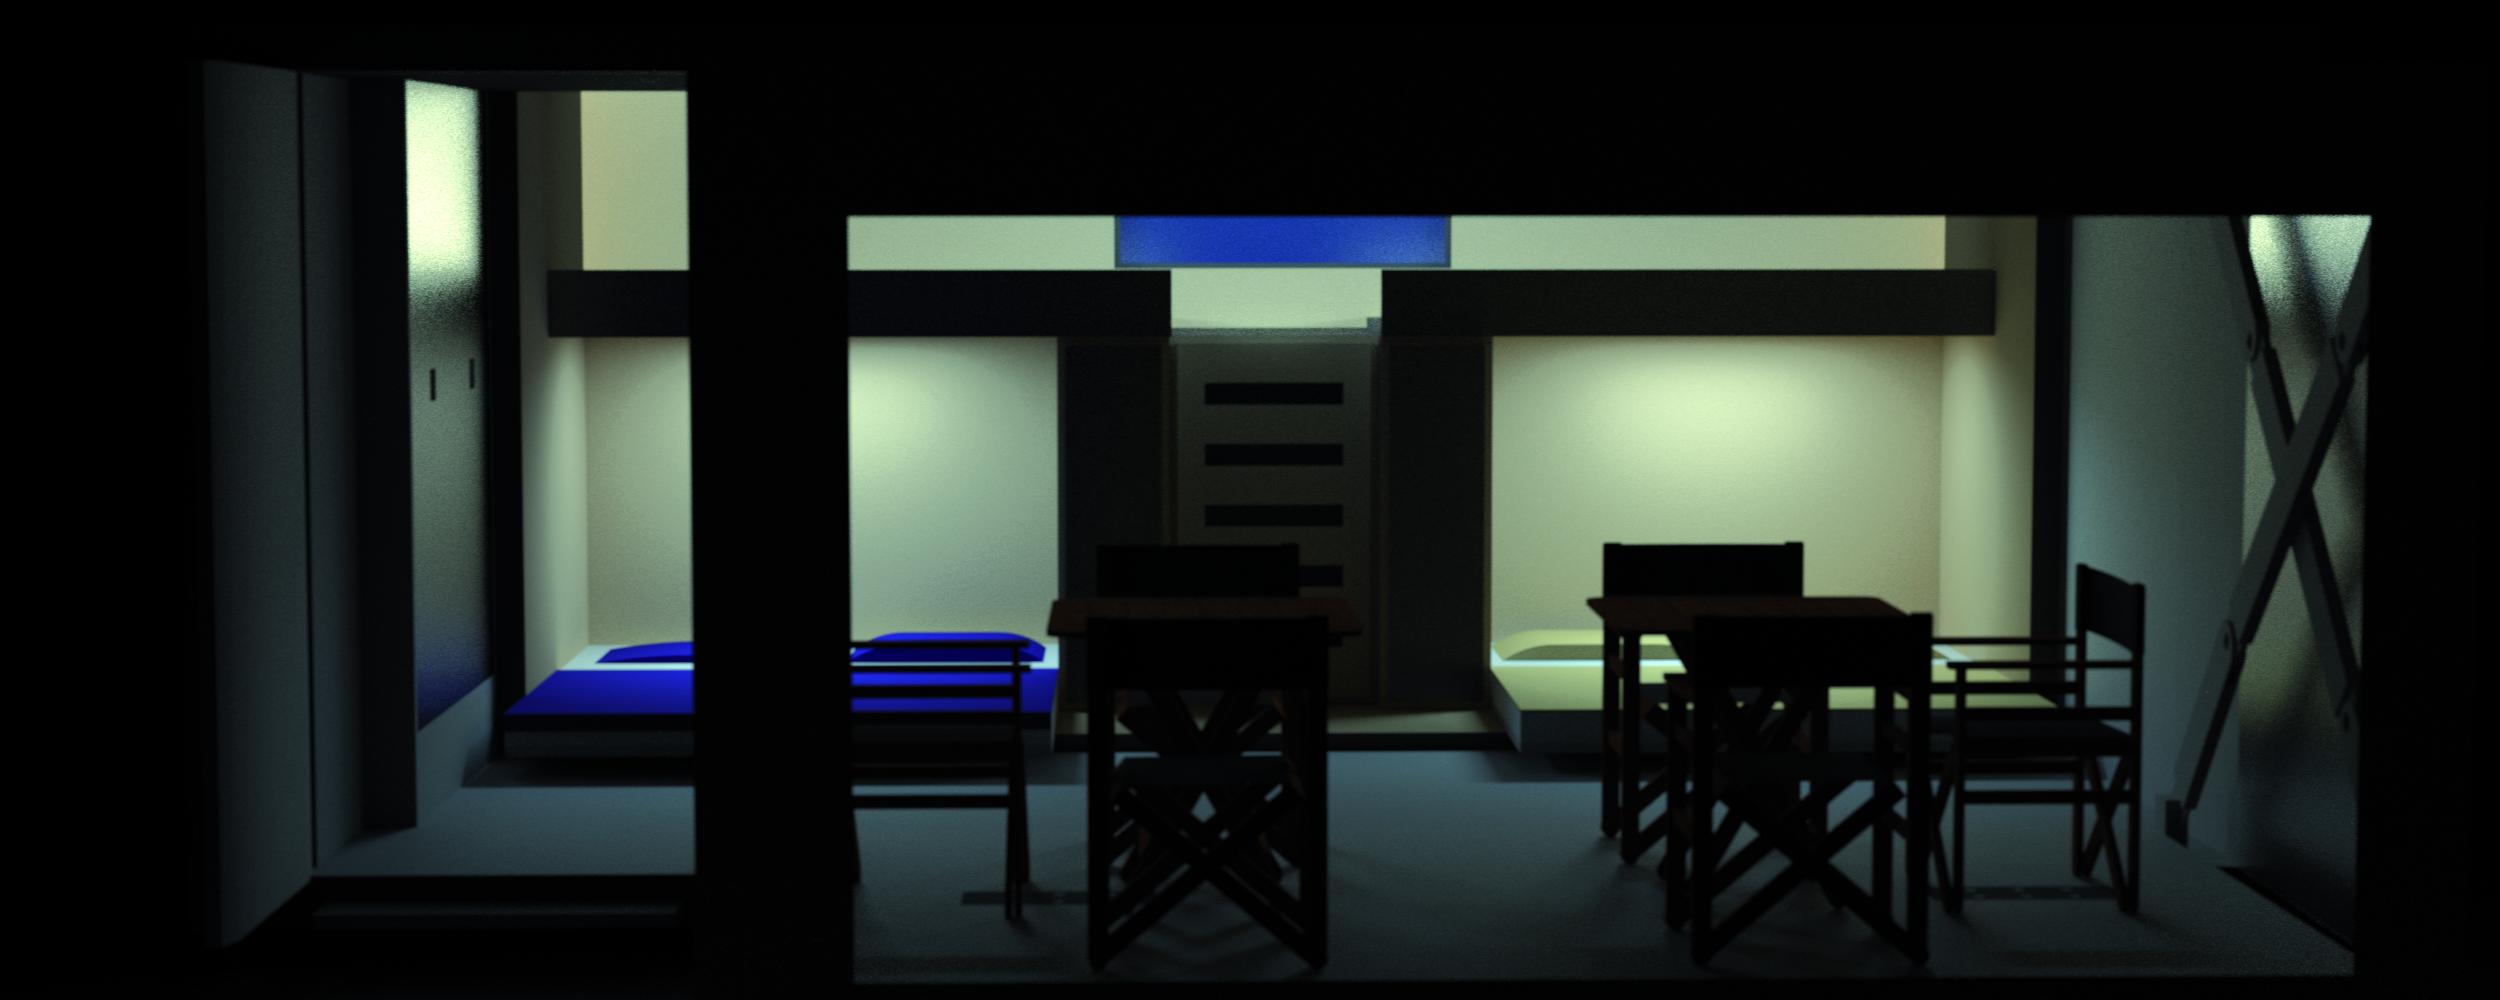 Night render_with furniture_night.jpg